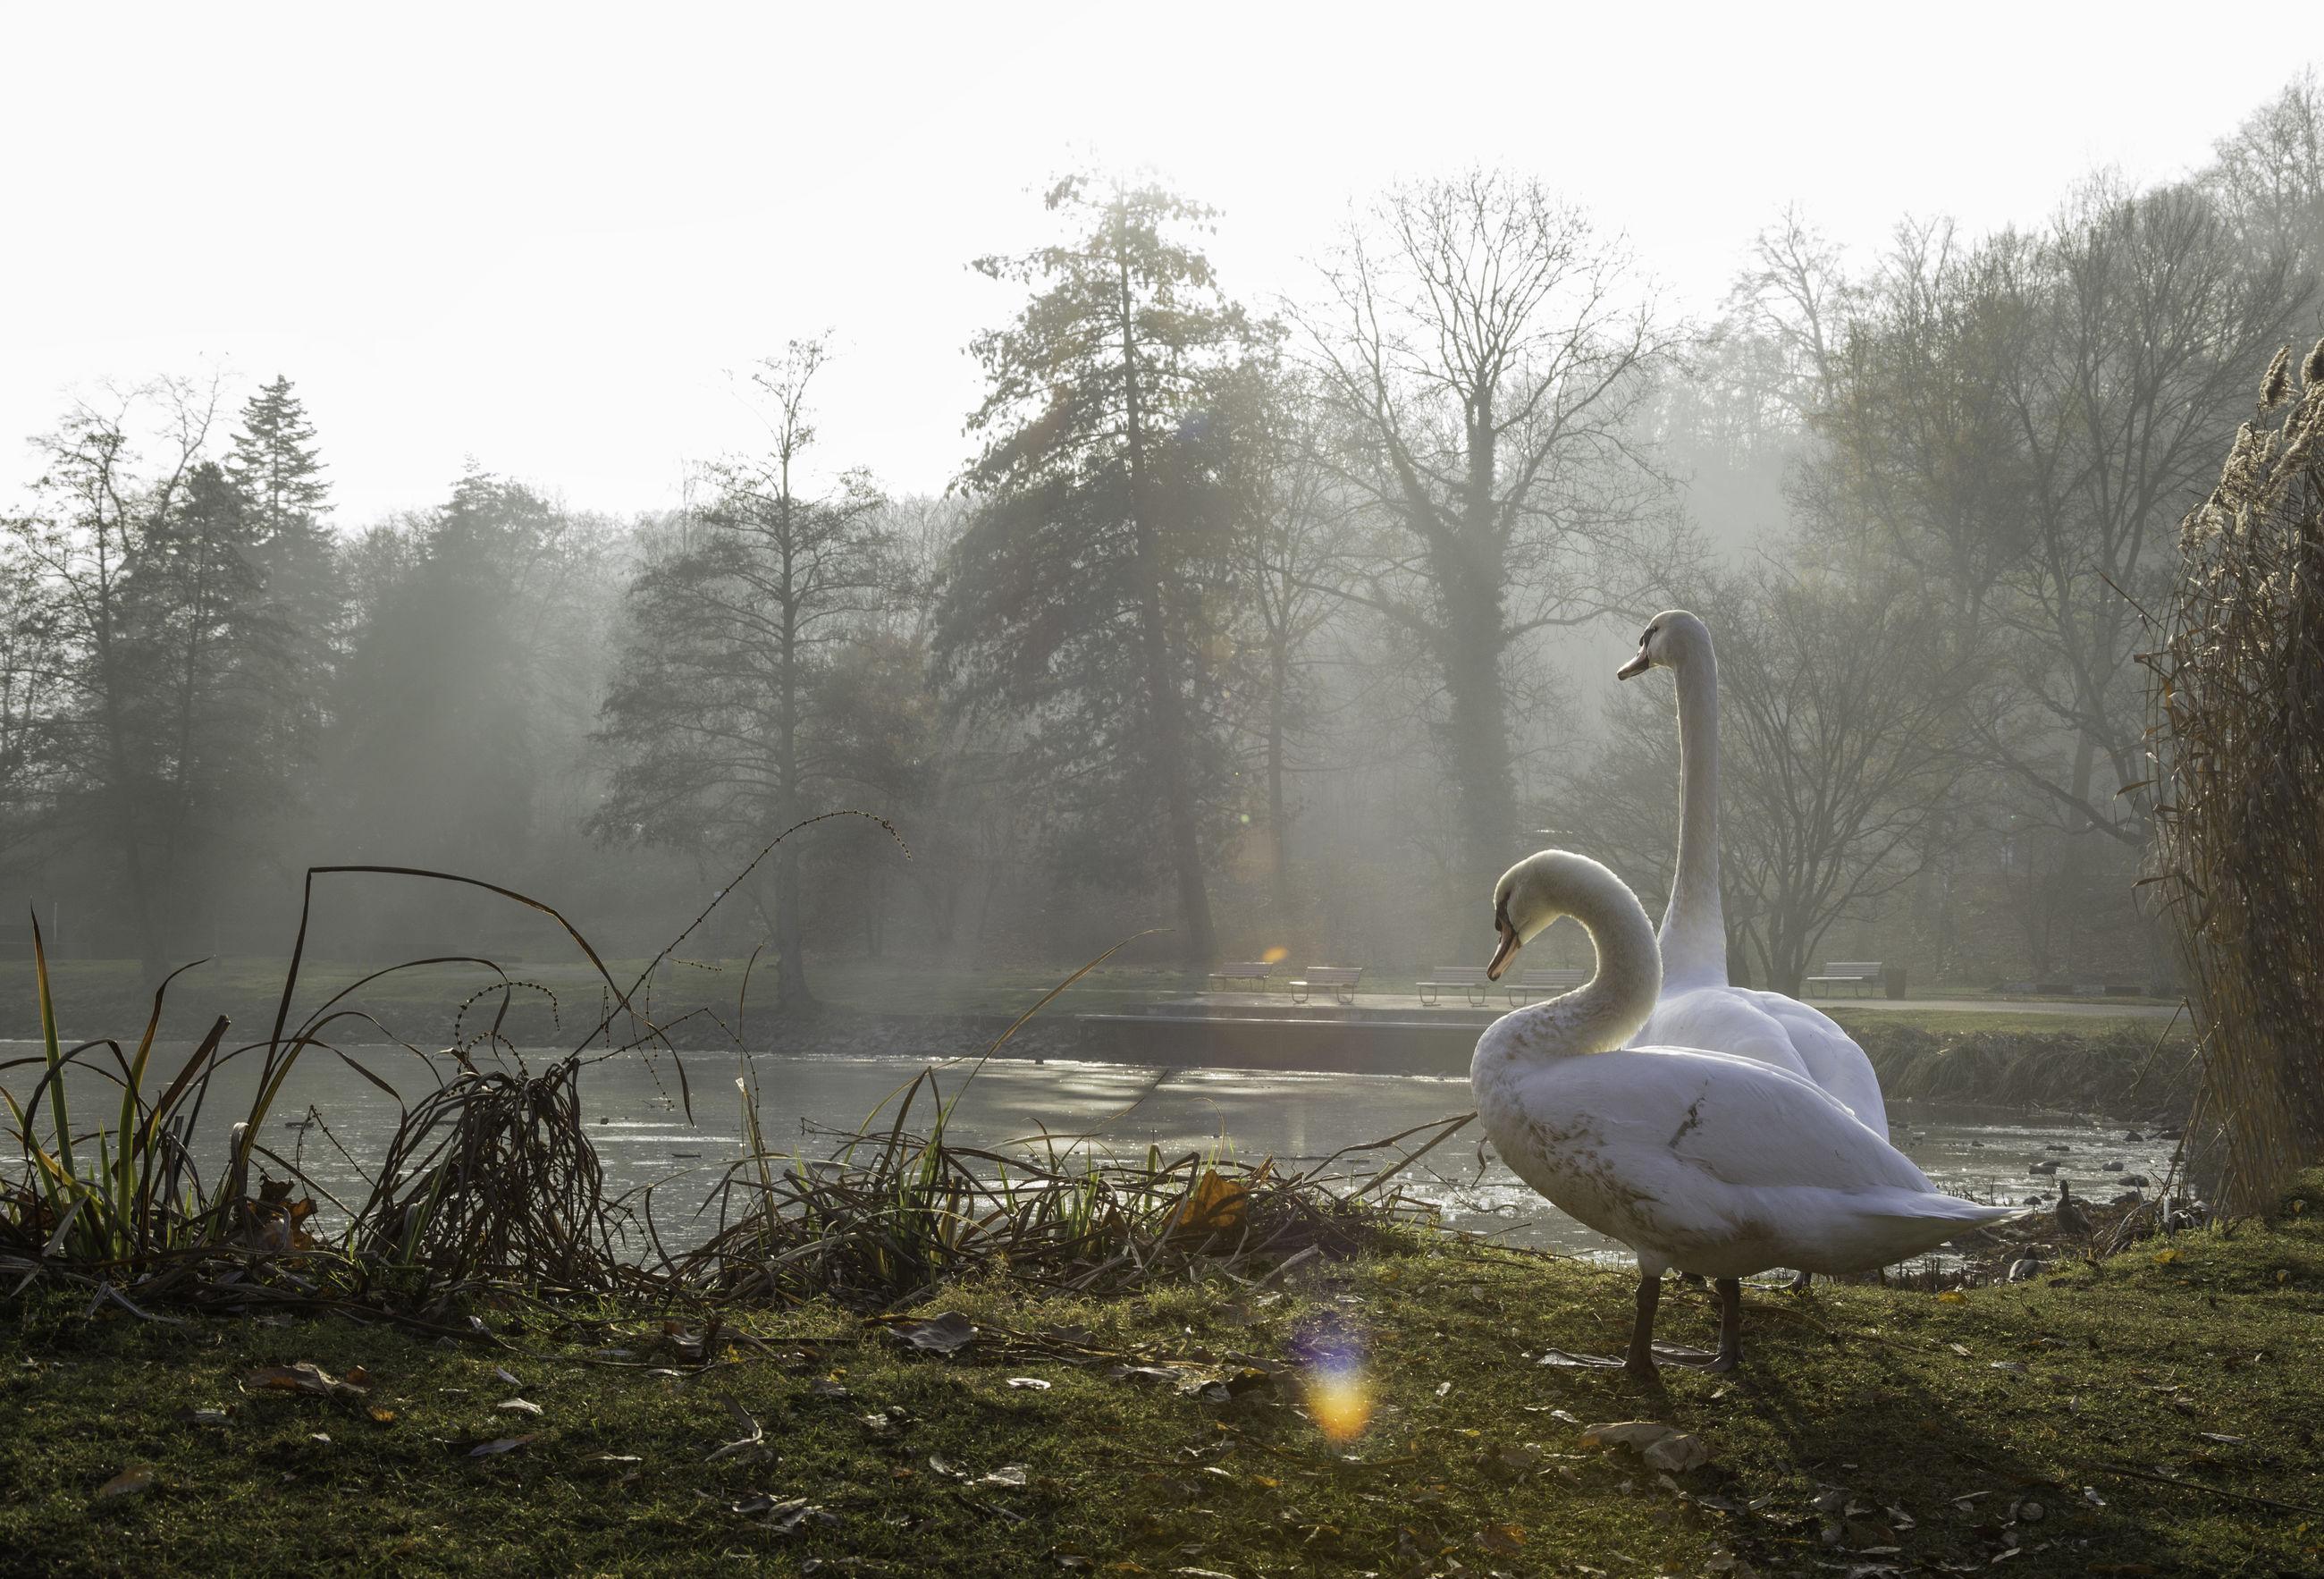 bird, water, animals in the wild, animal themes, lake, tree, nature, animal wildlife, swan, day, outdoors, no people, grass, black swan